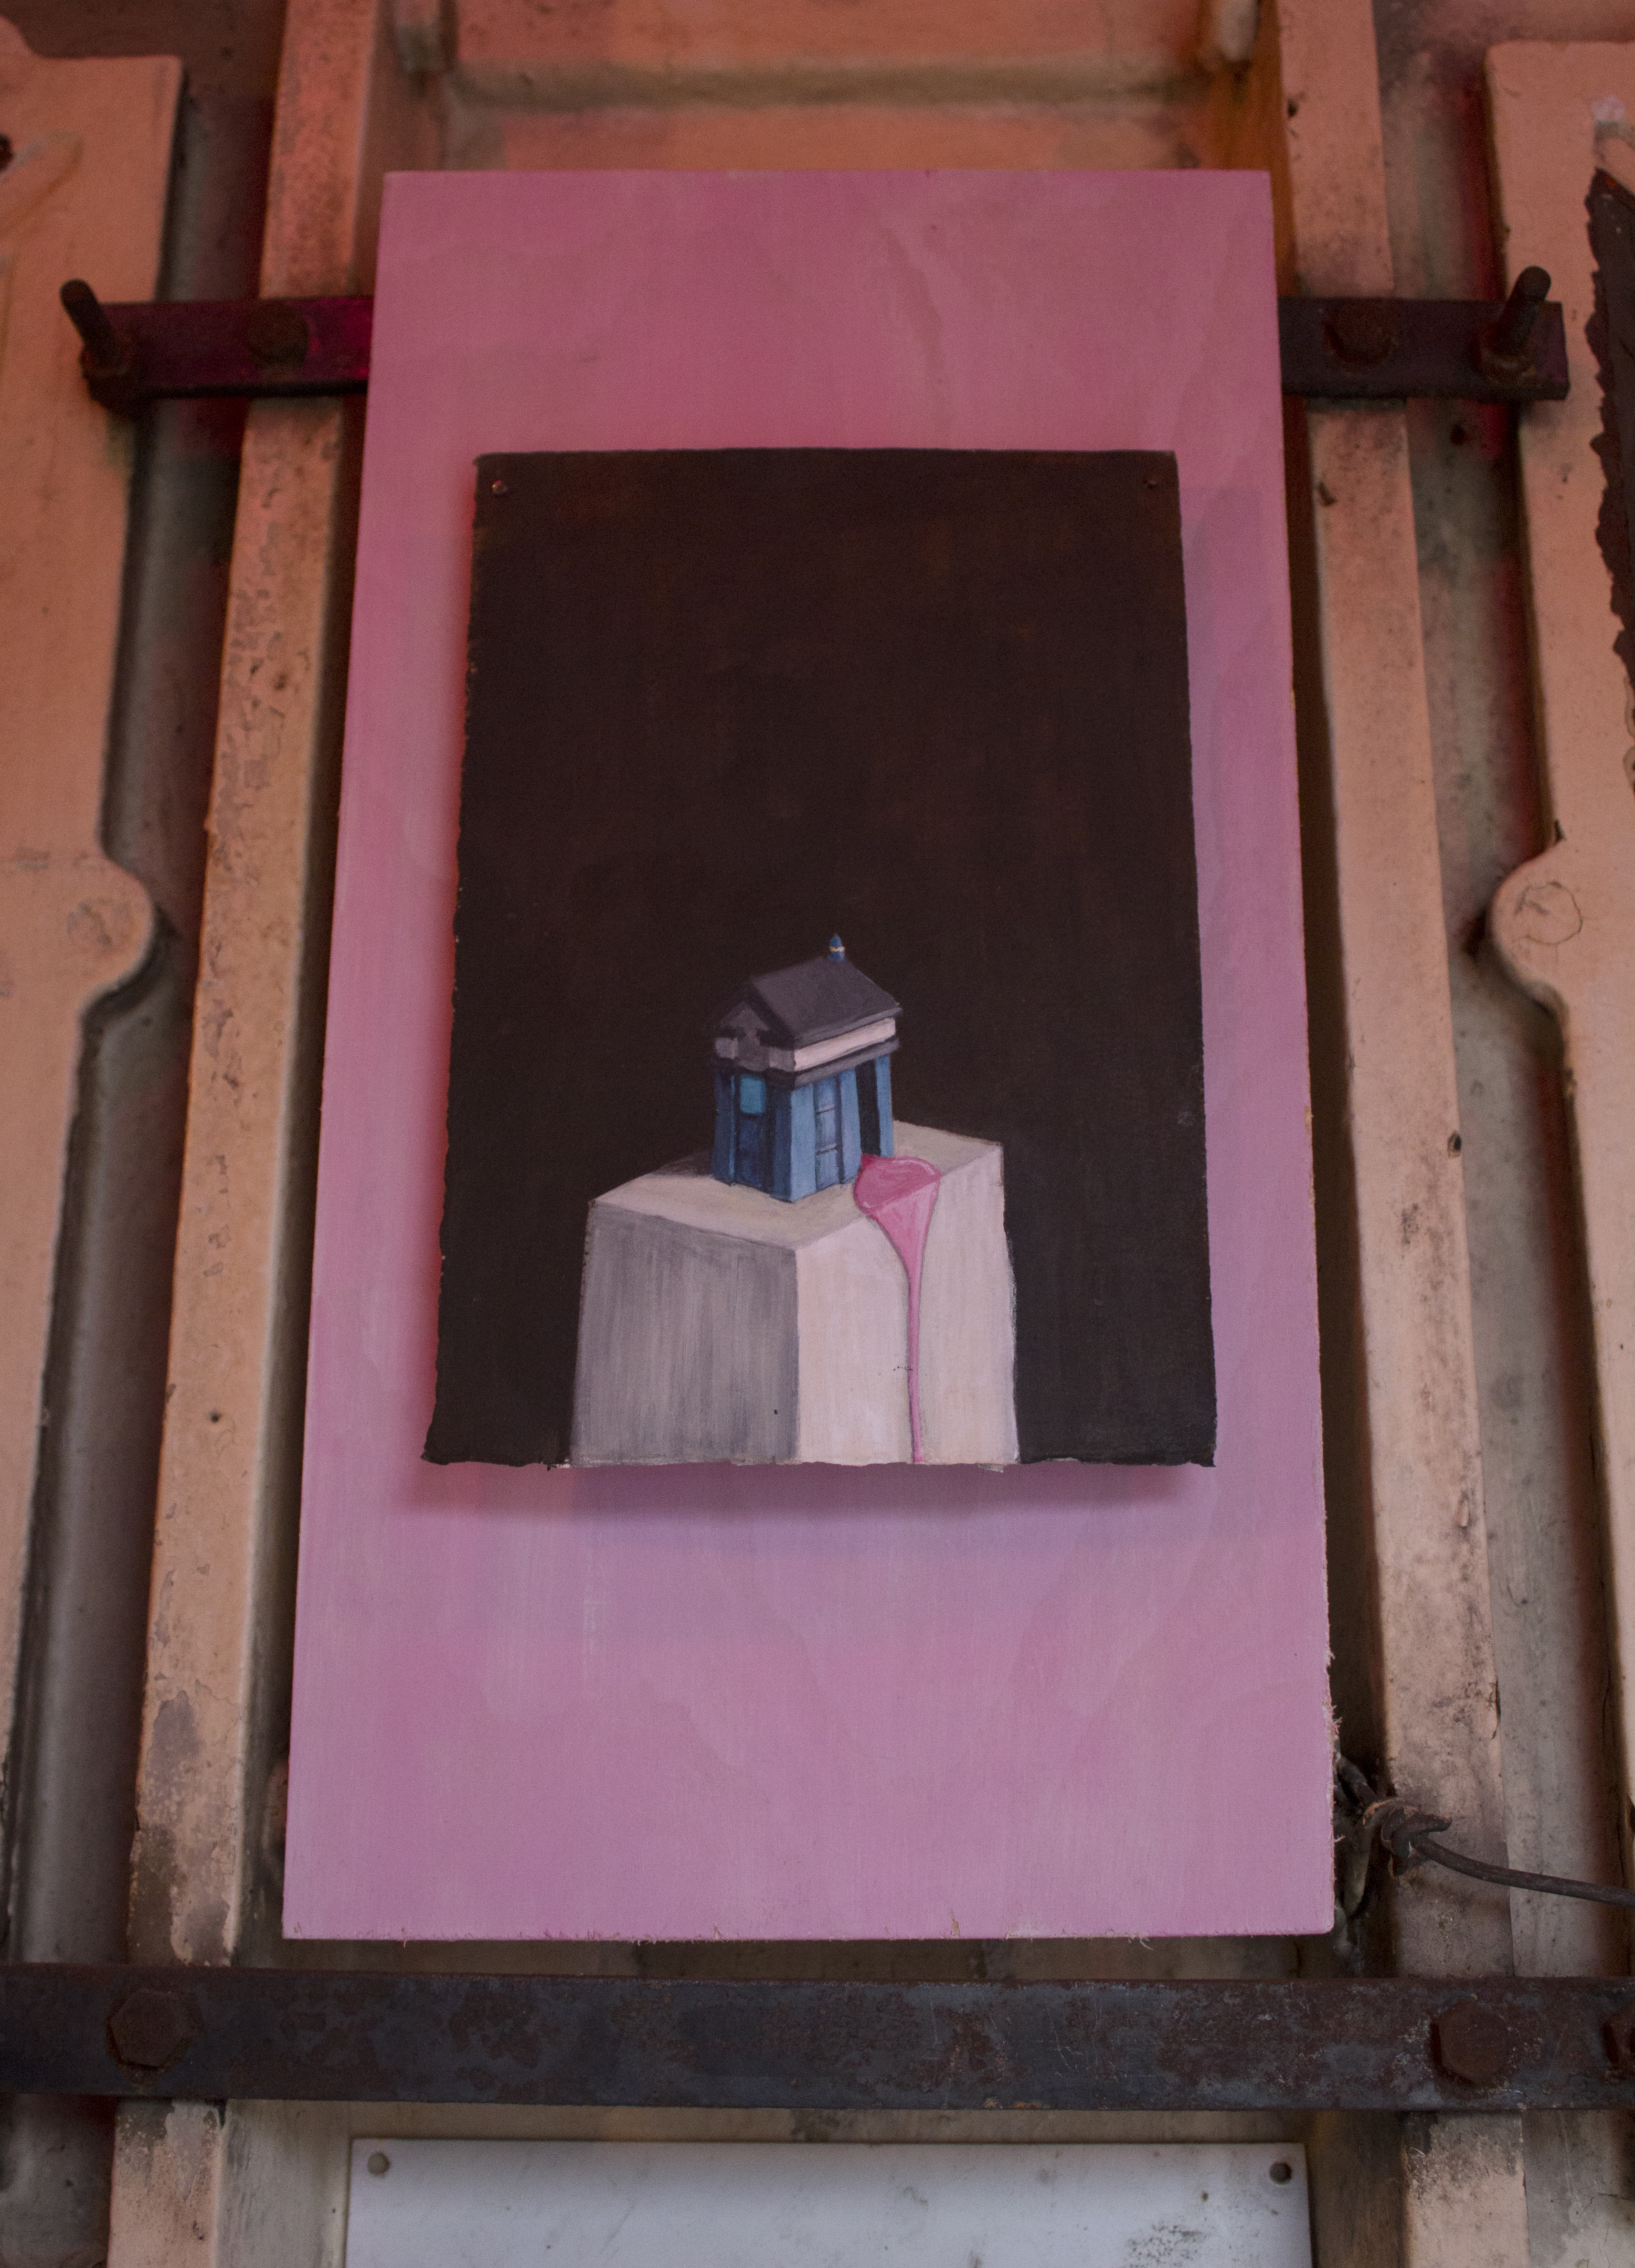 Tardis painting install shot